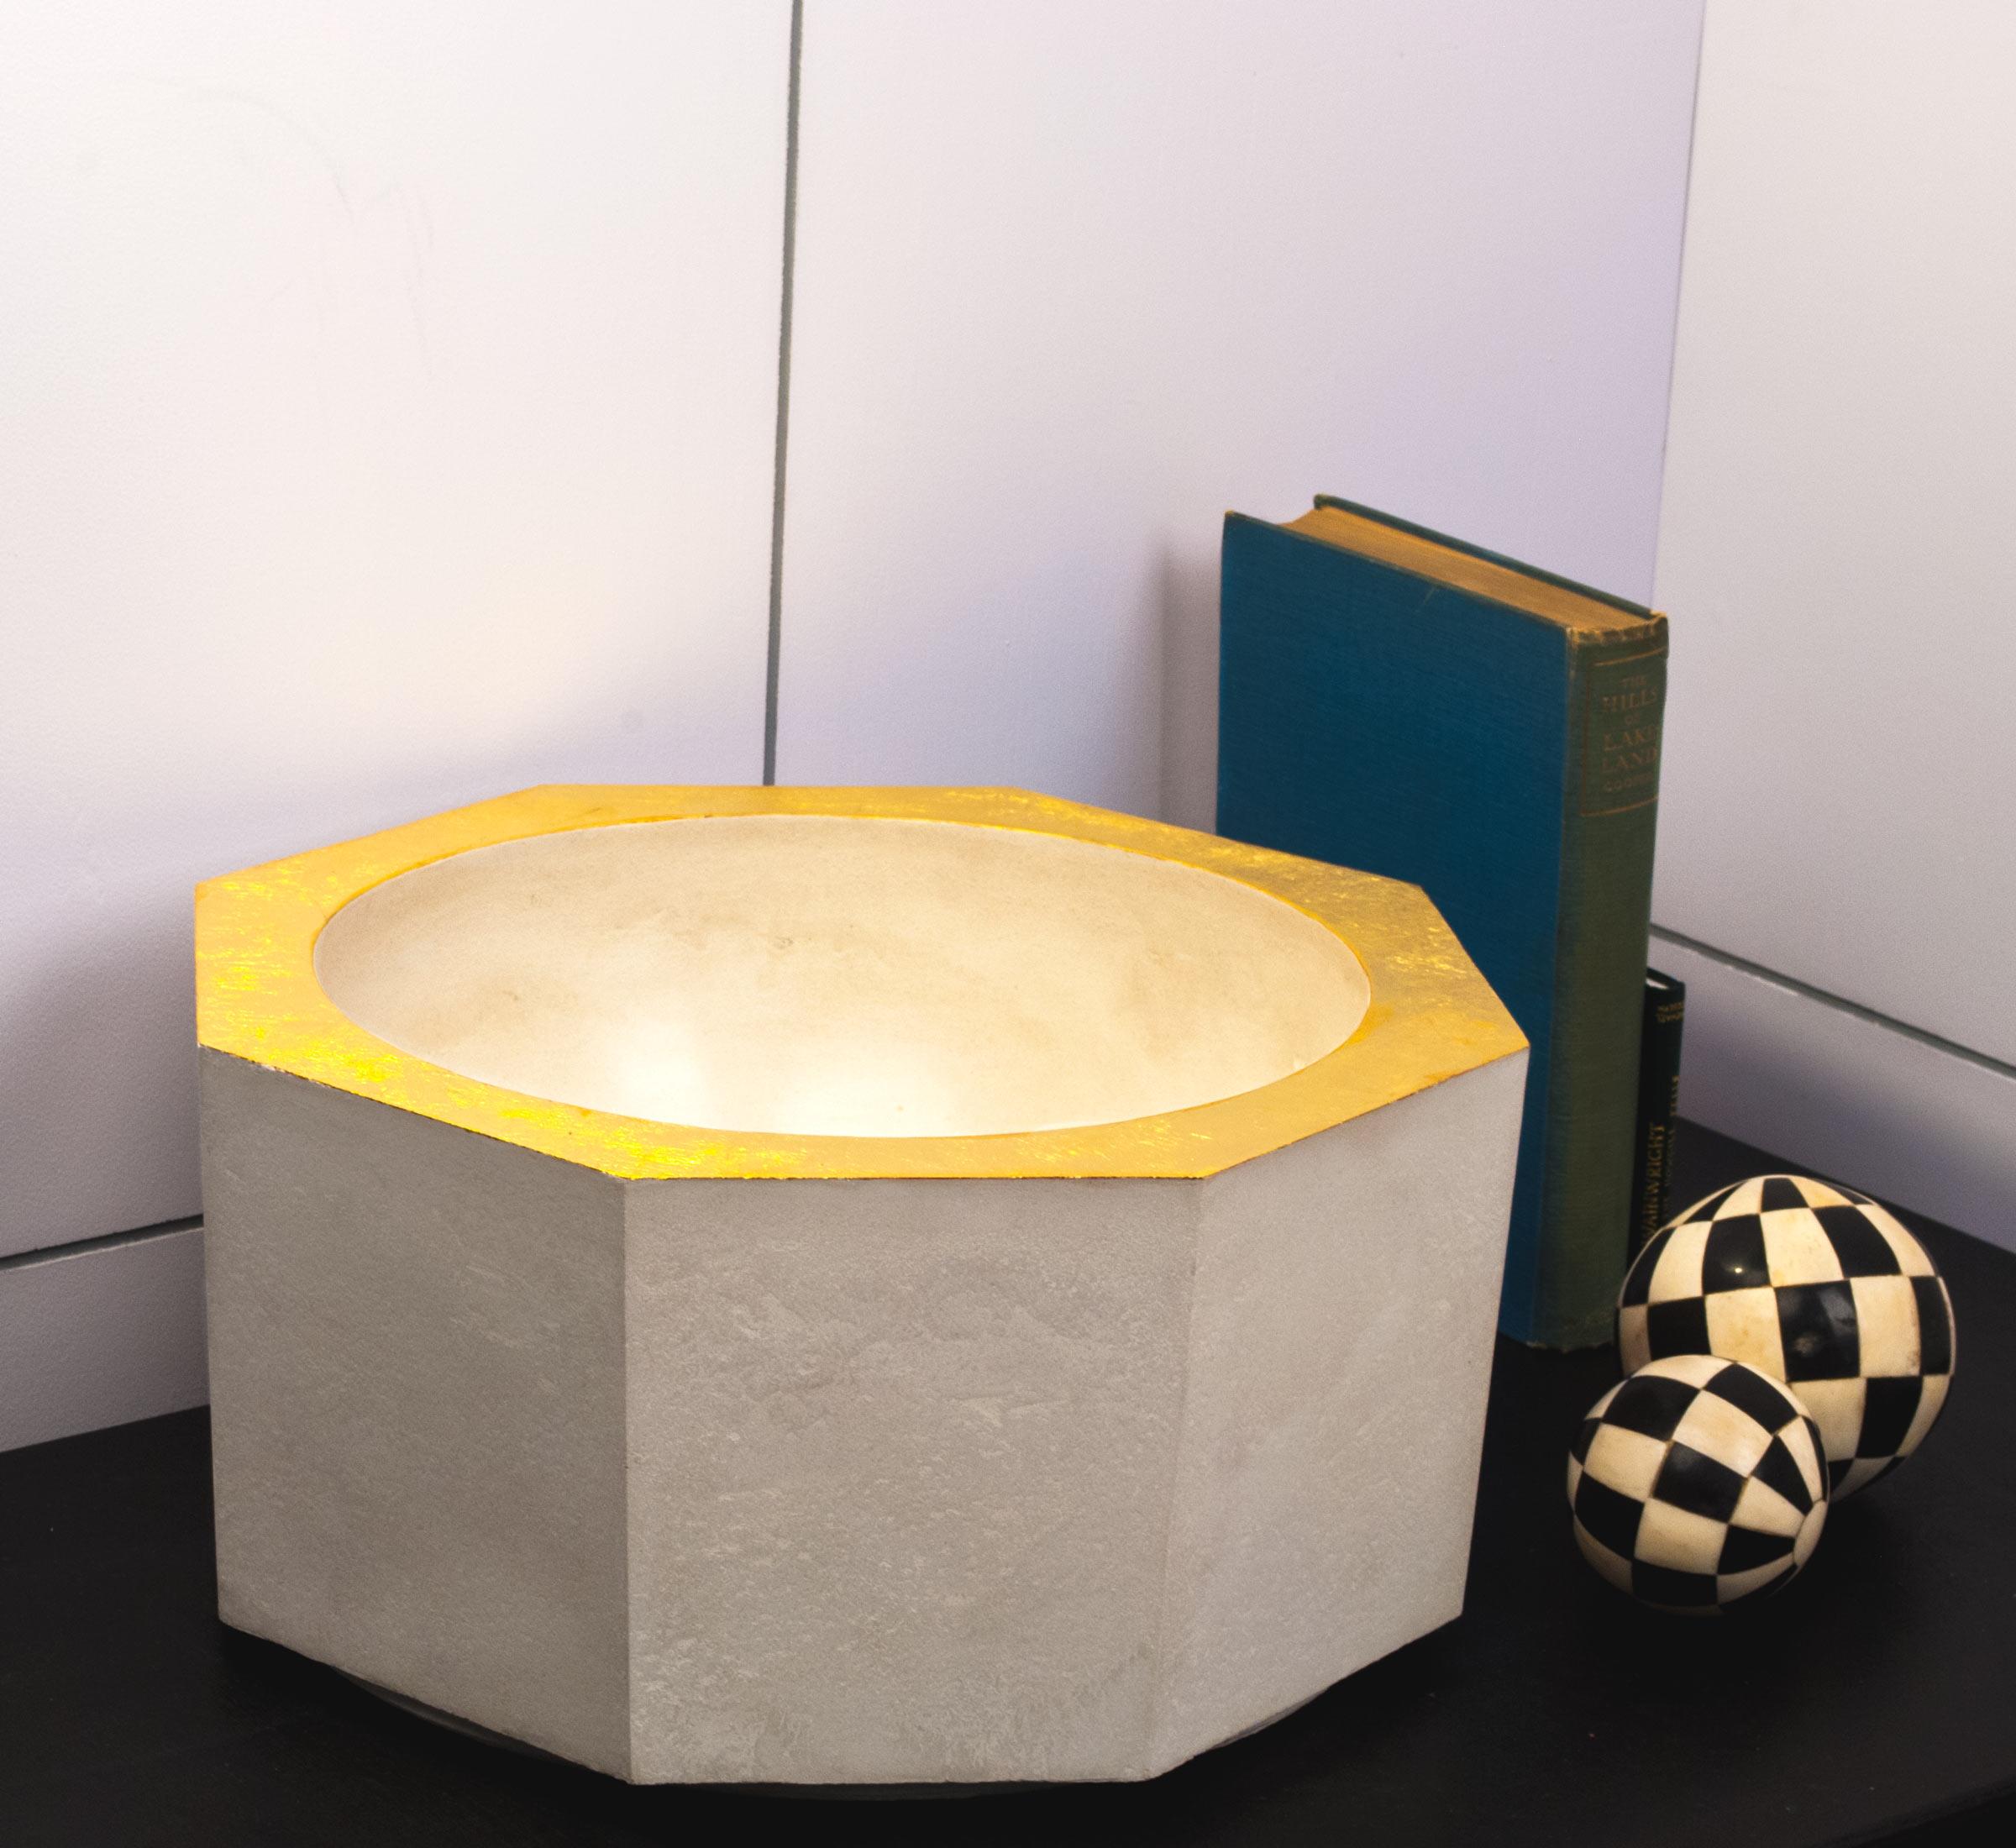 Gold-Bowel-on-table-comp.jpg